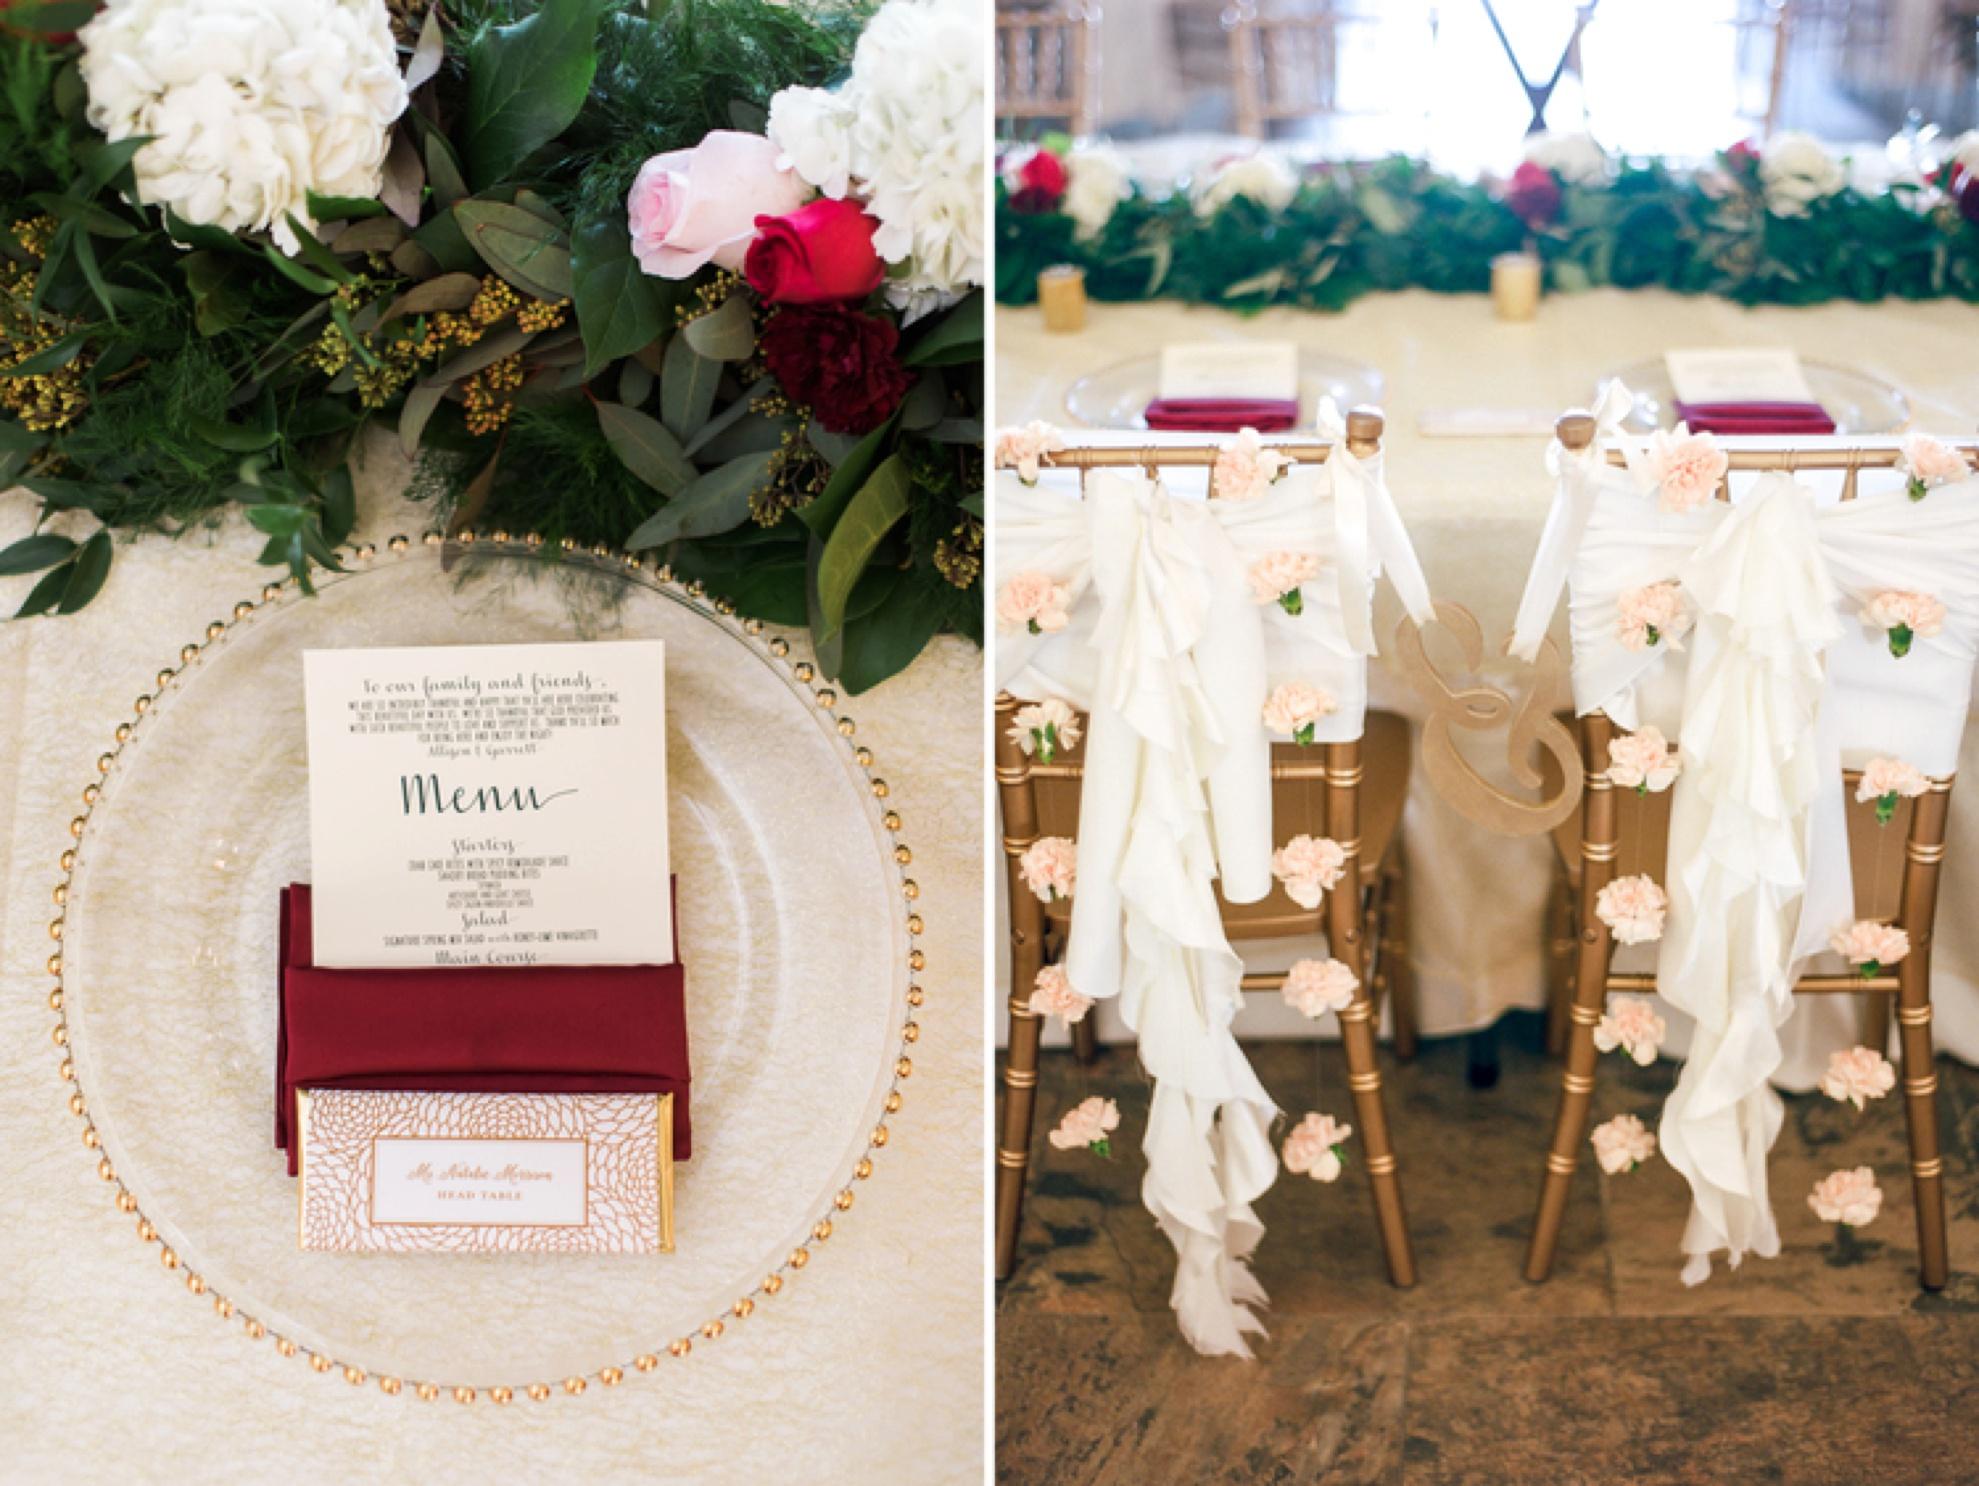 Tuscan-Courtyard-Wedding-Venue-Texas-City-Ceremony-Reception-Photographer-Dana-Fernandez-Photography-4.jpg